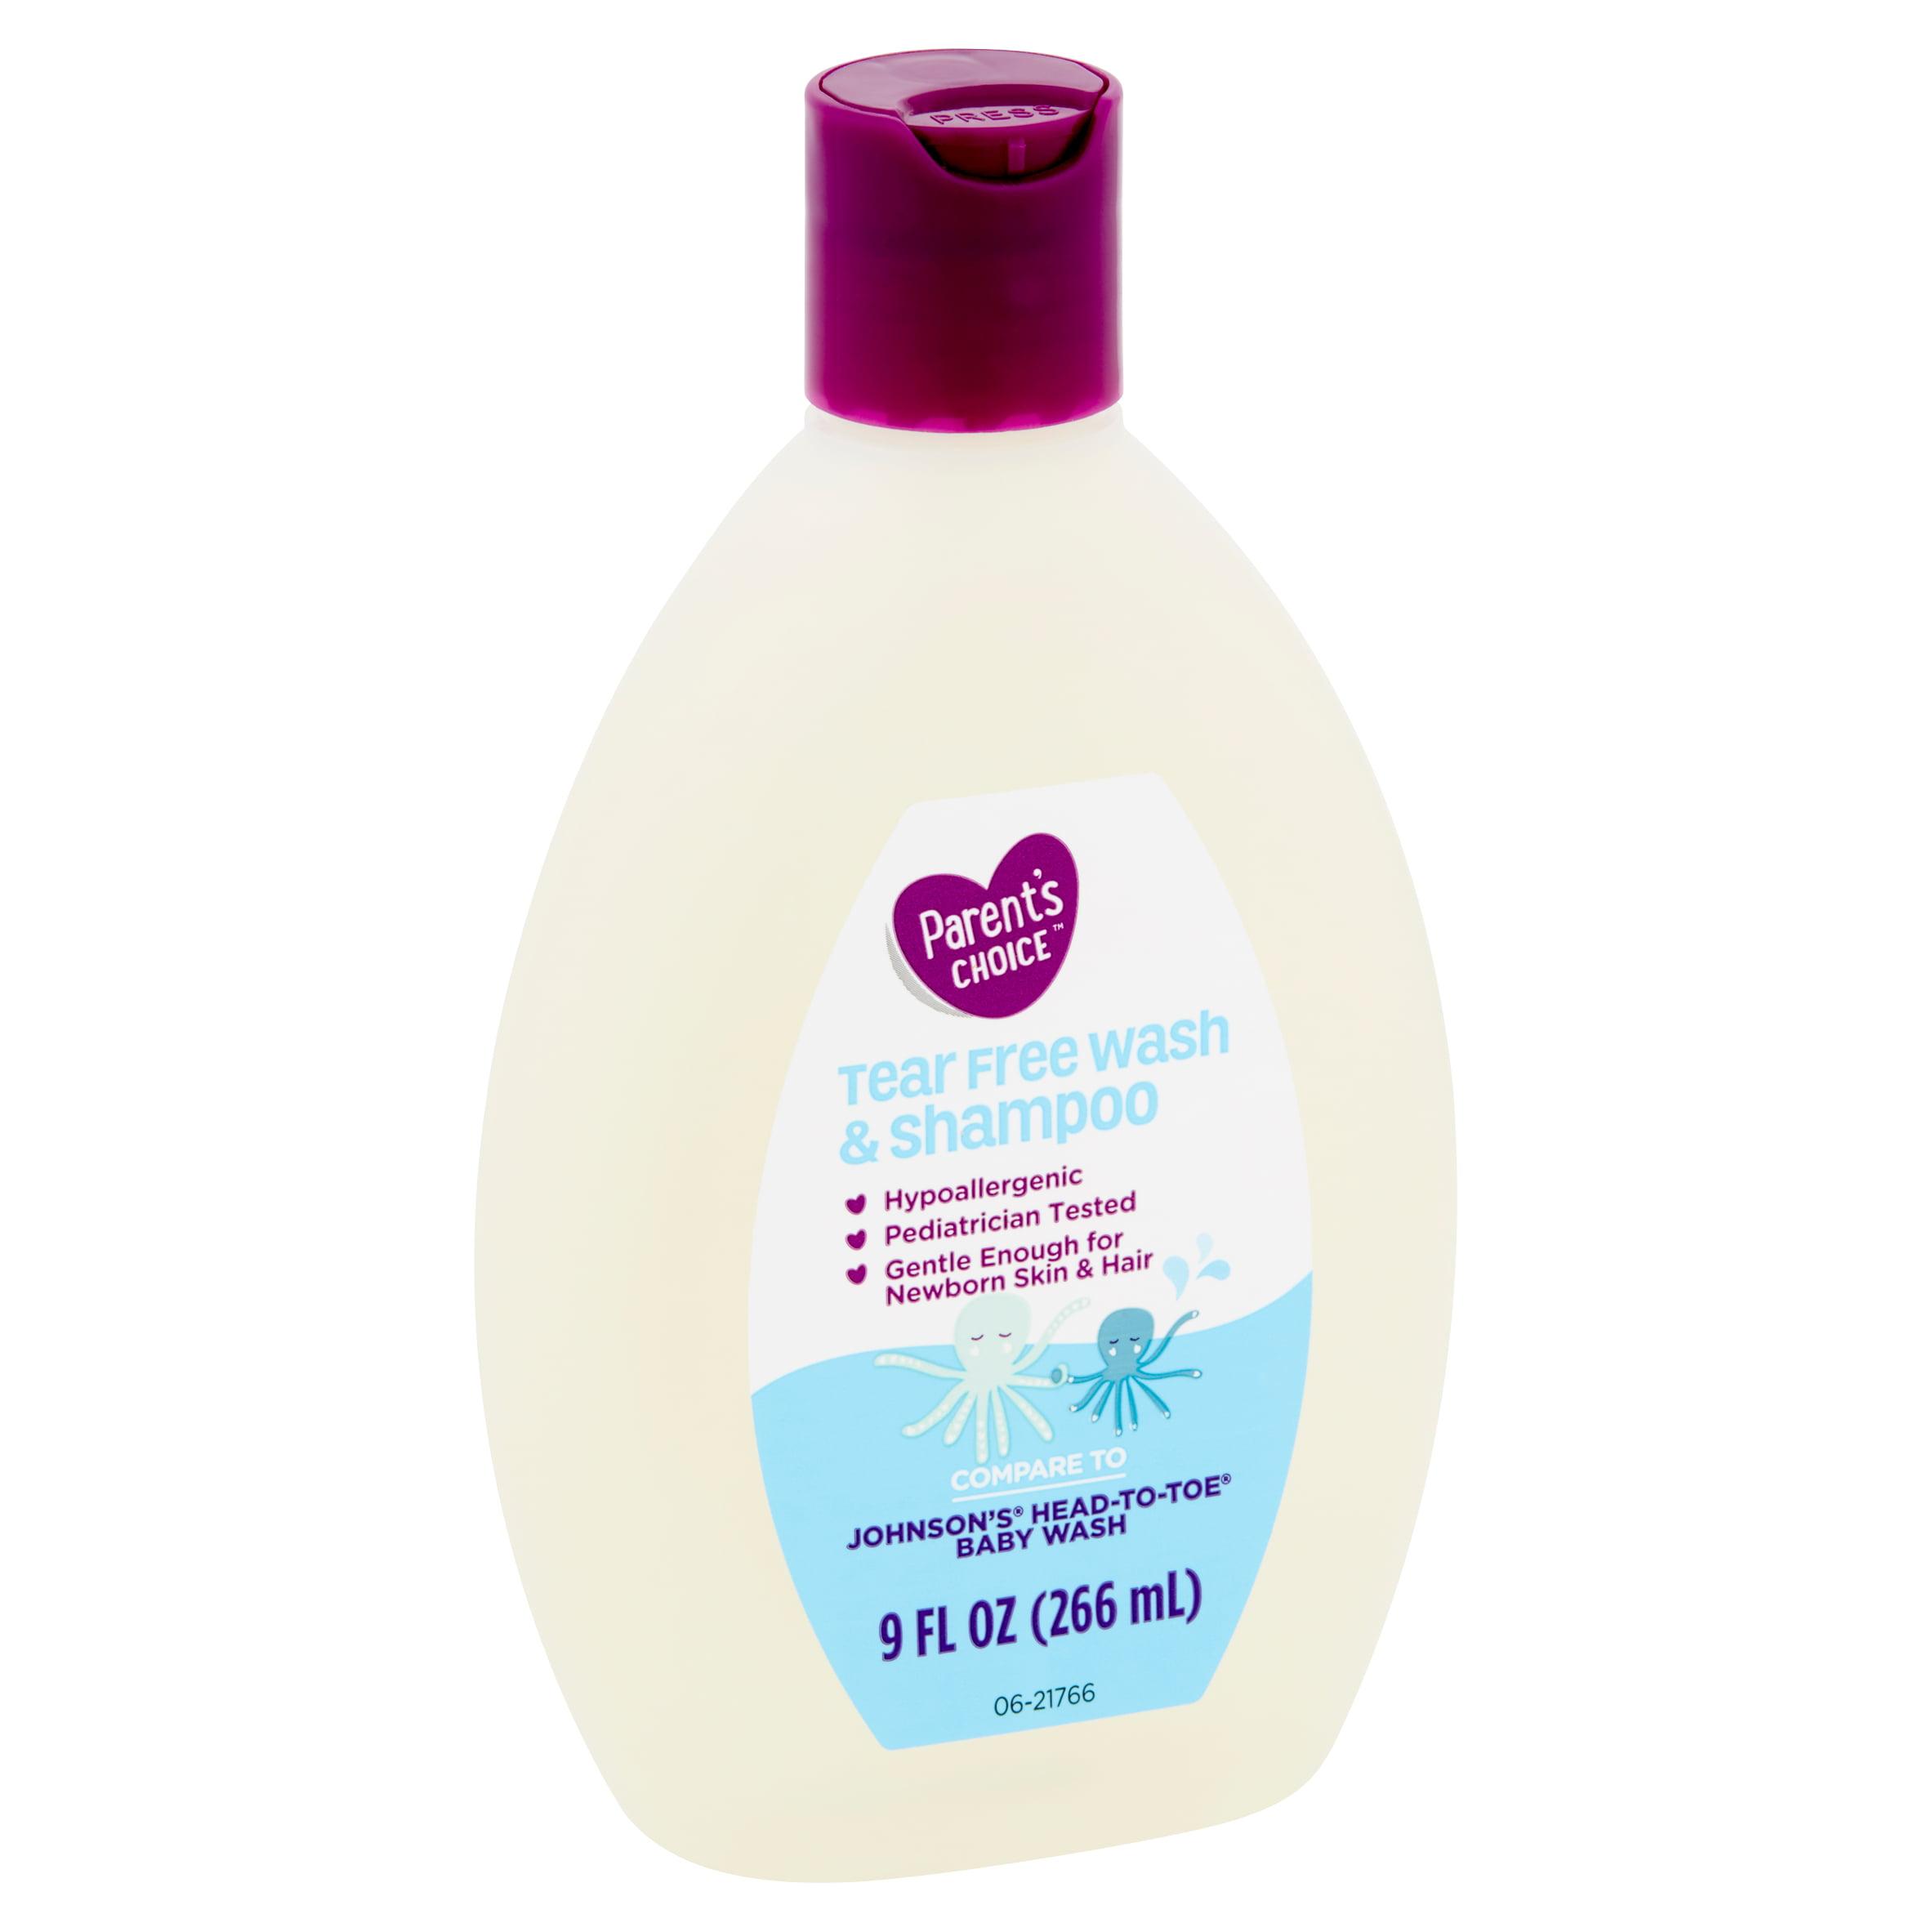 Parent's Choice Tear-Free Baby Wash & Shampoo, 9 fl oz